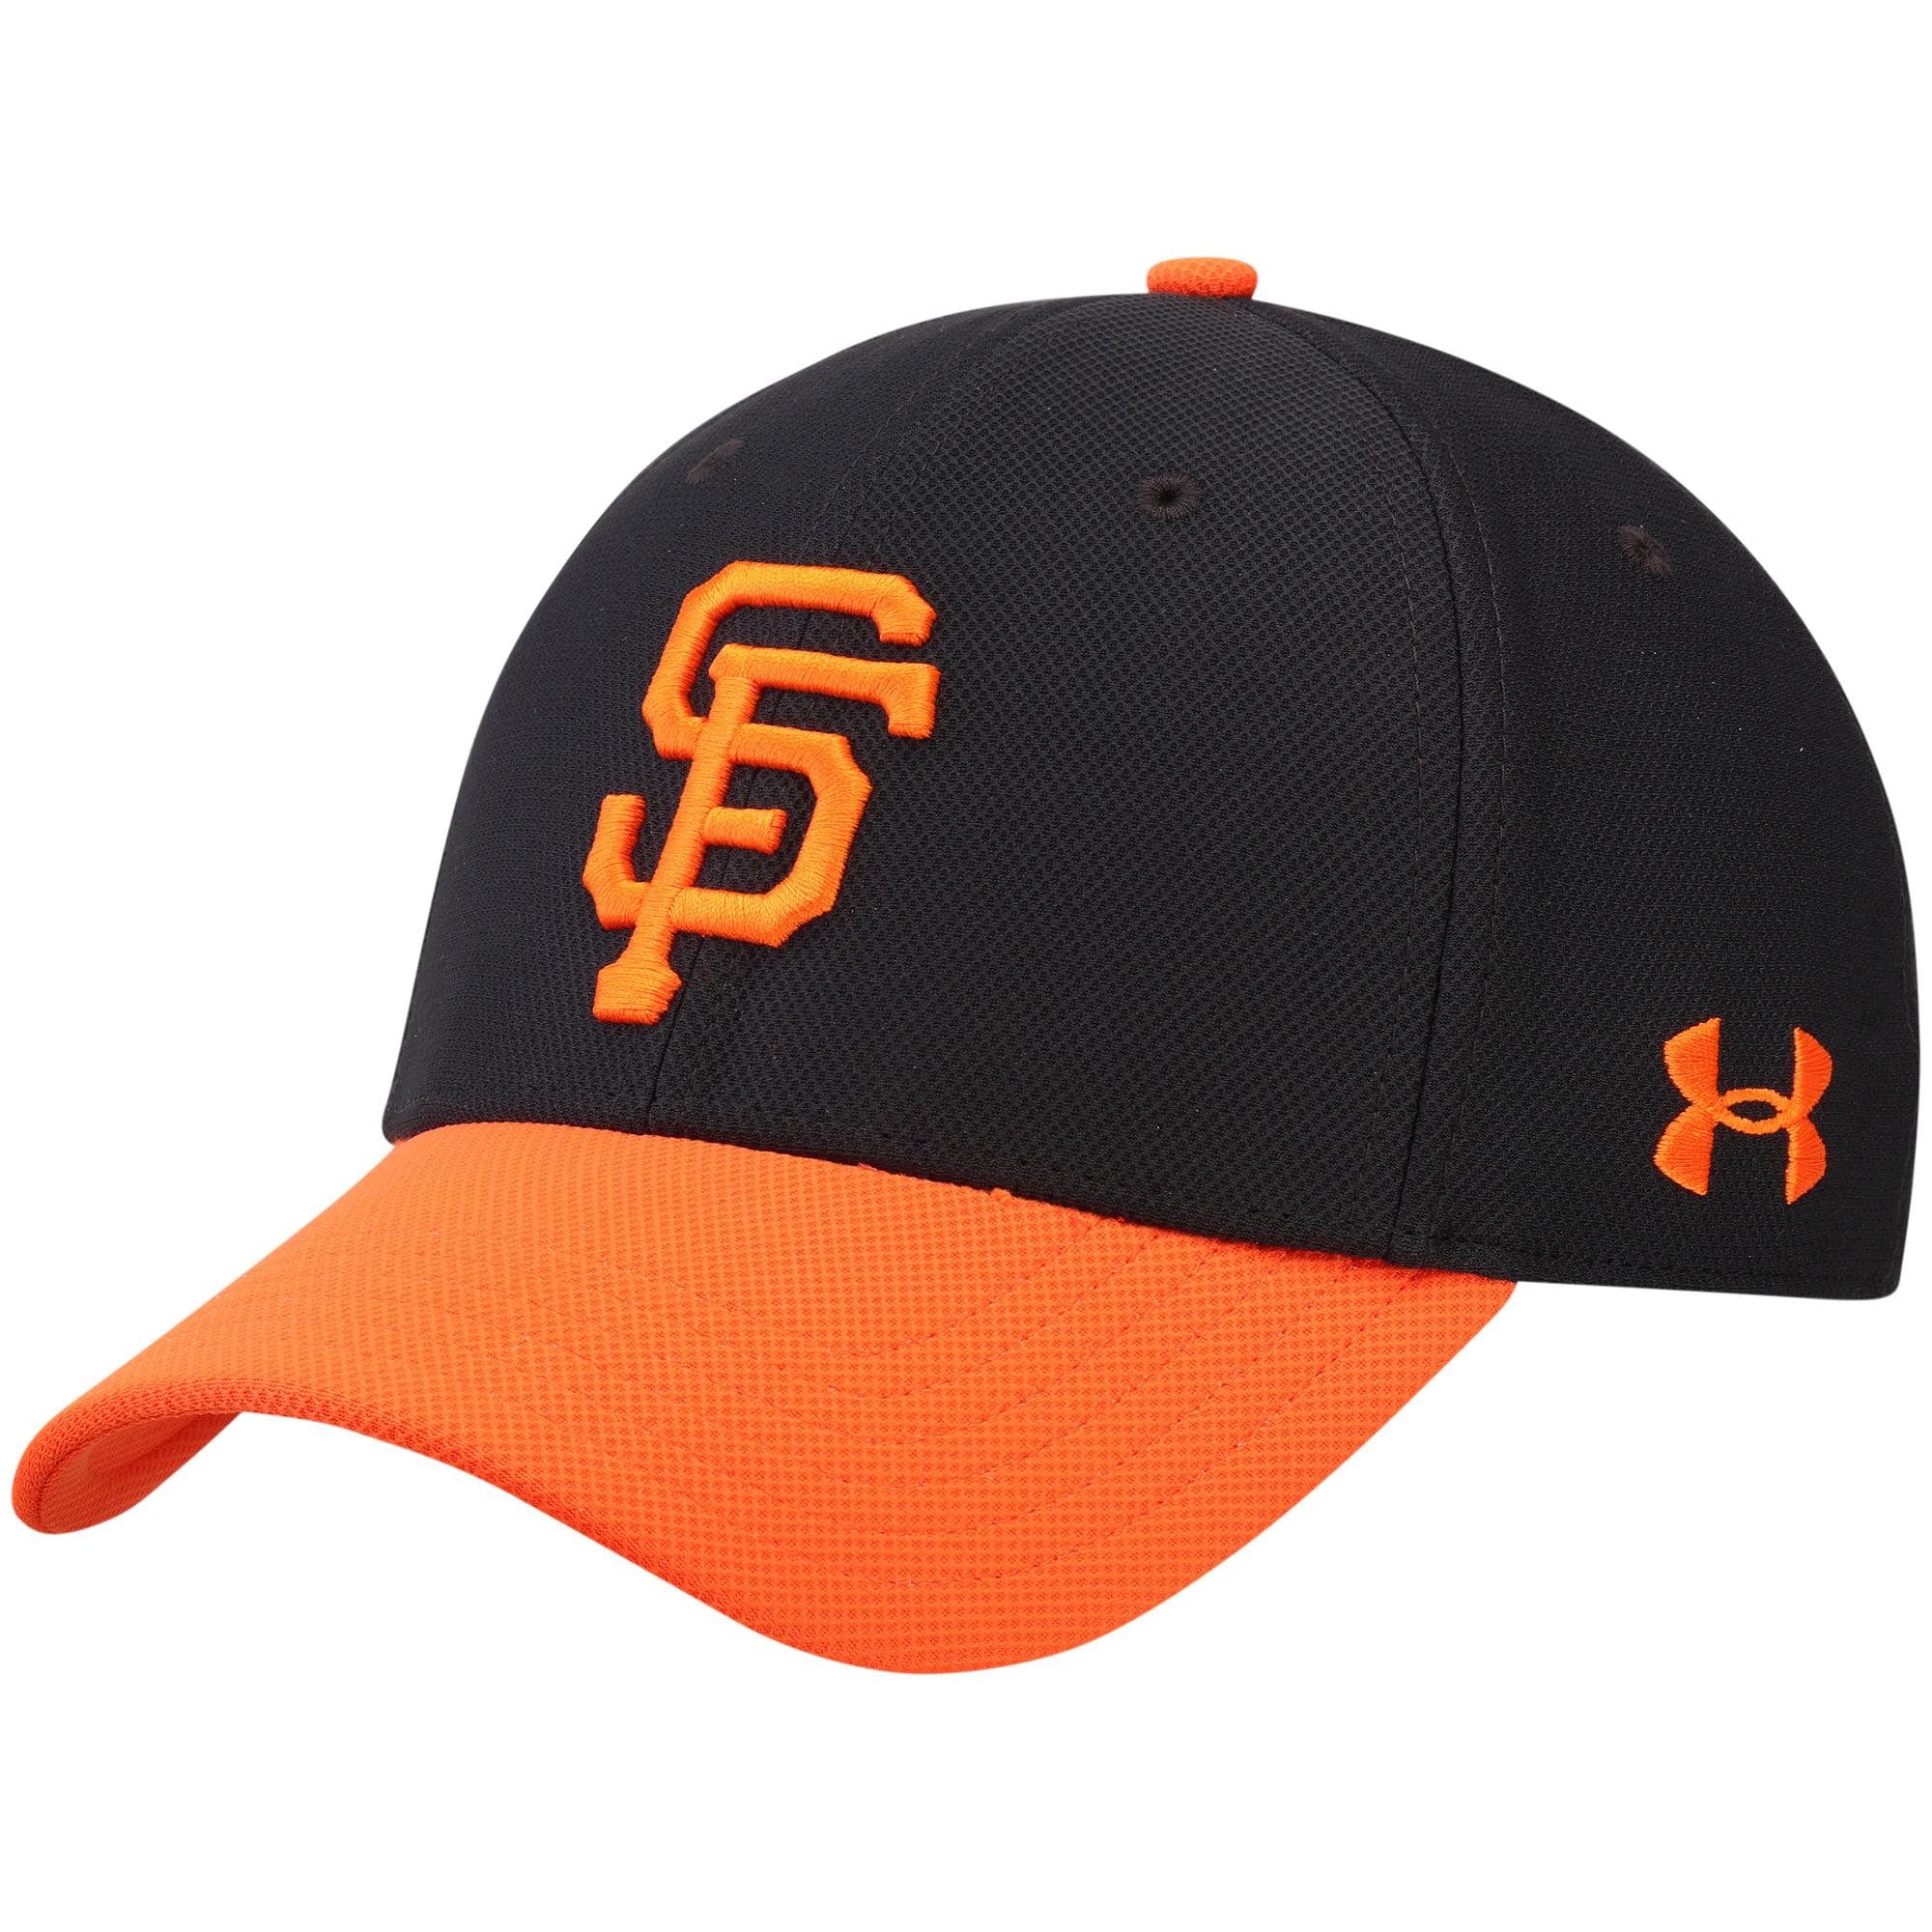 San Francisco Giants Under Armour Blitzing Performance Adjustable Hat - Black/Orange - OSFA